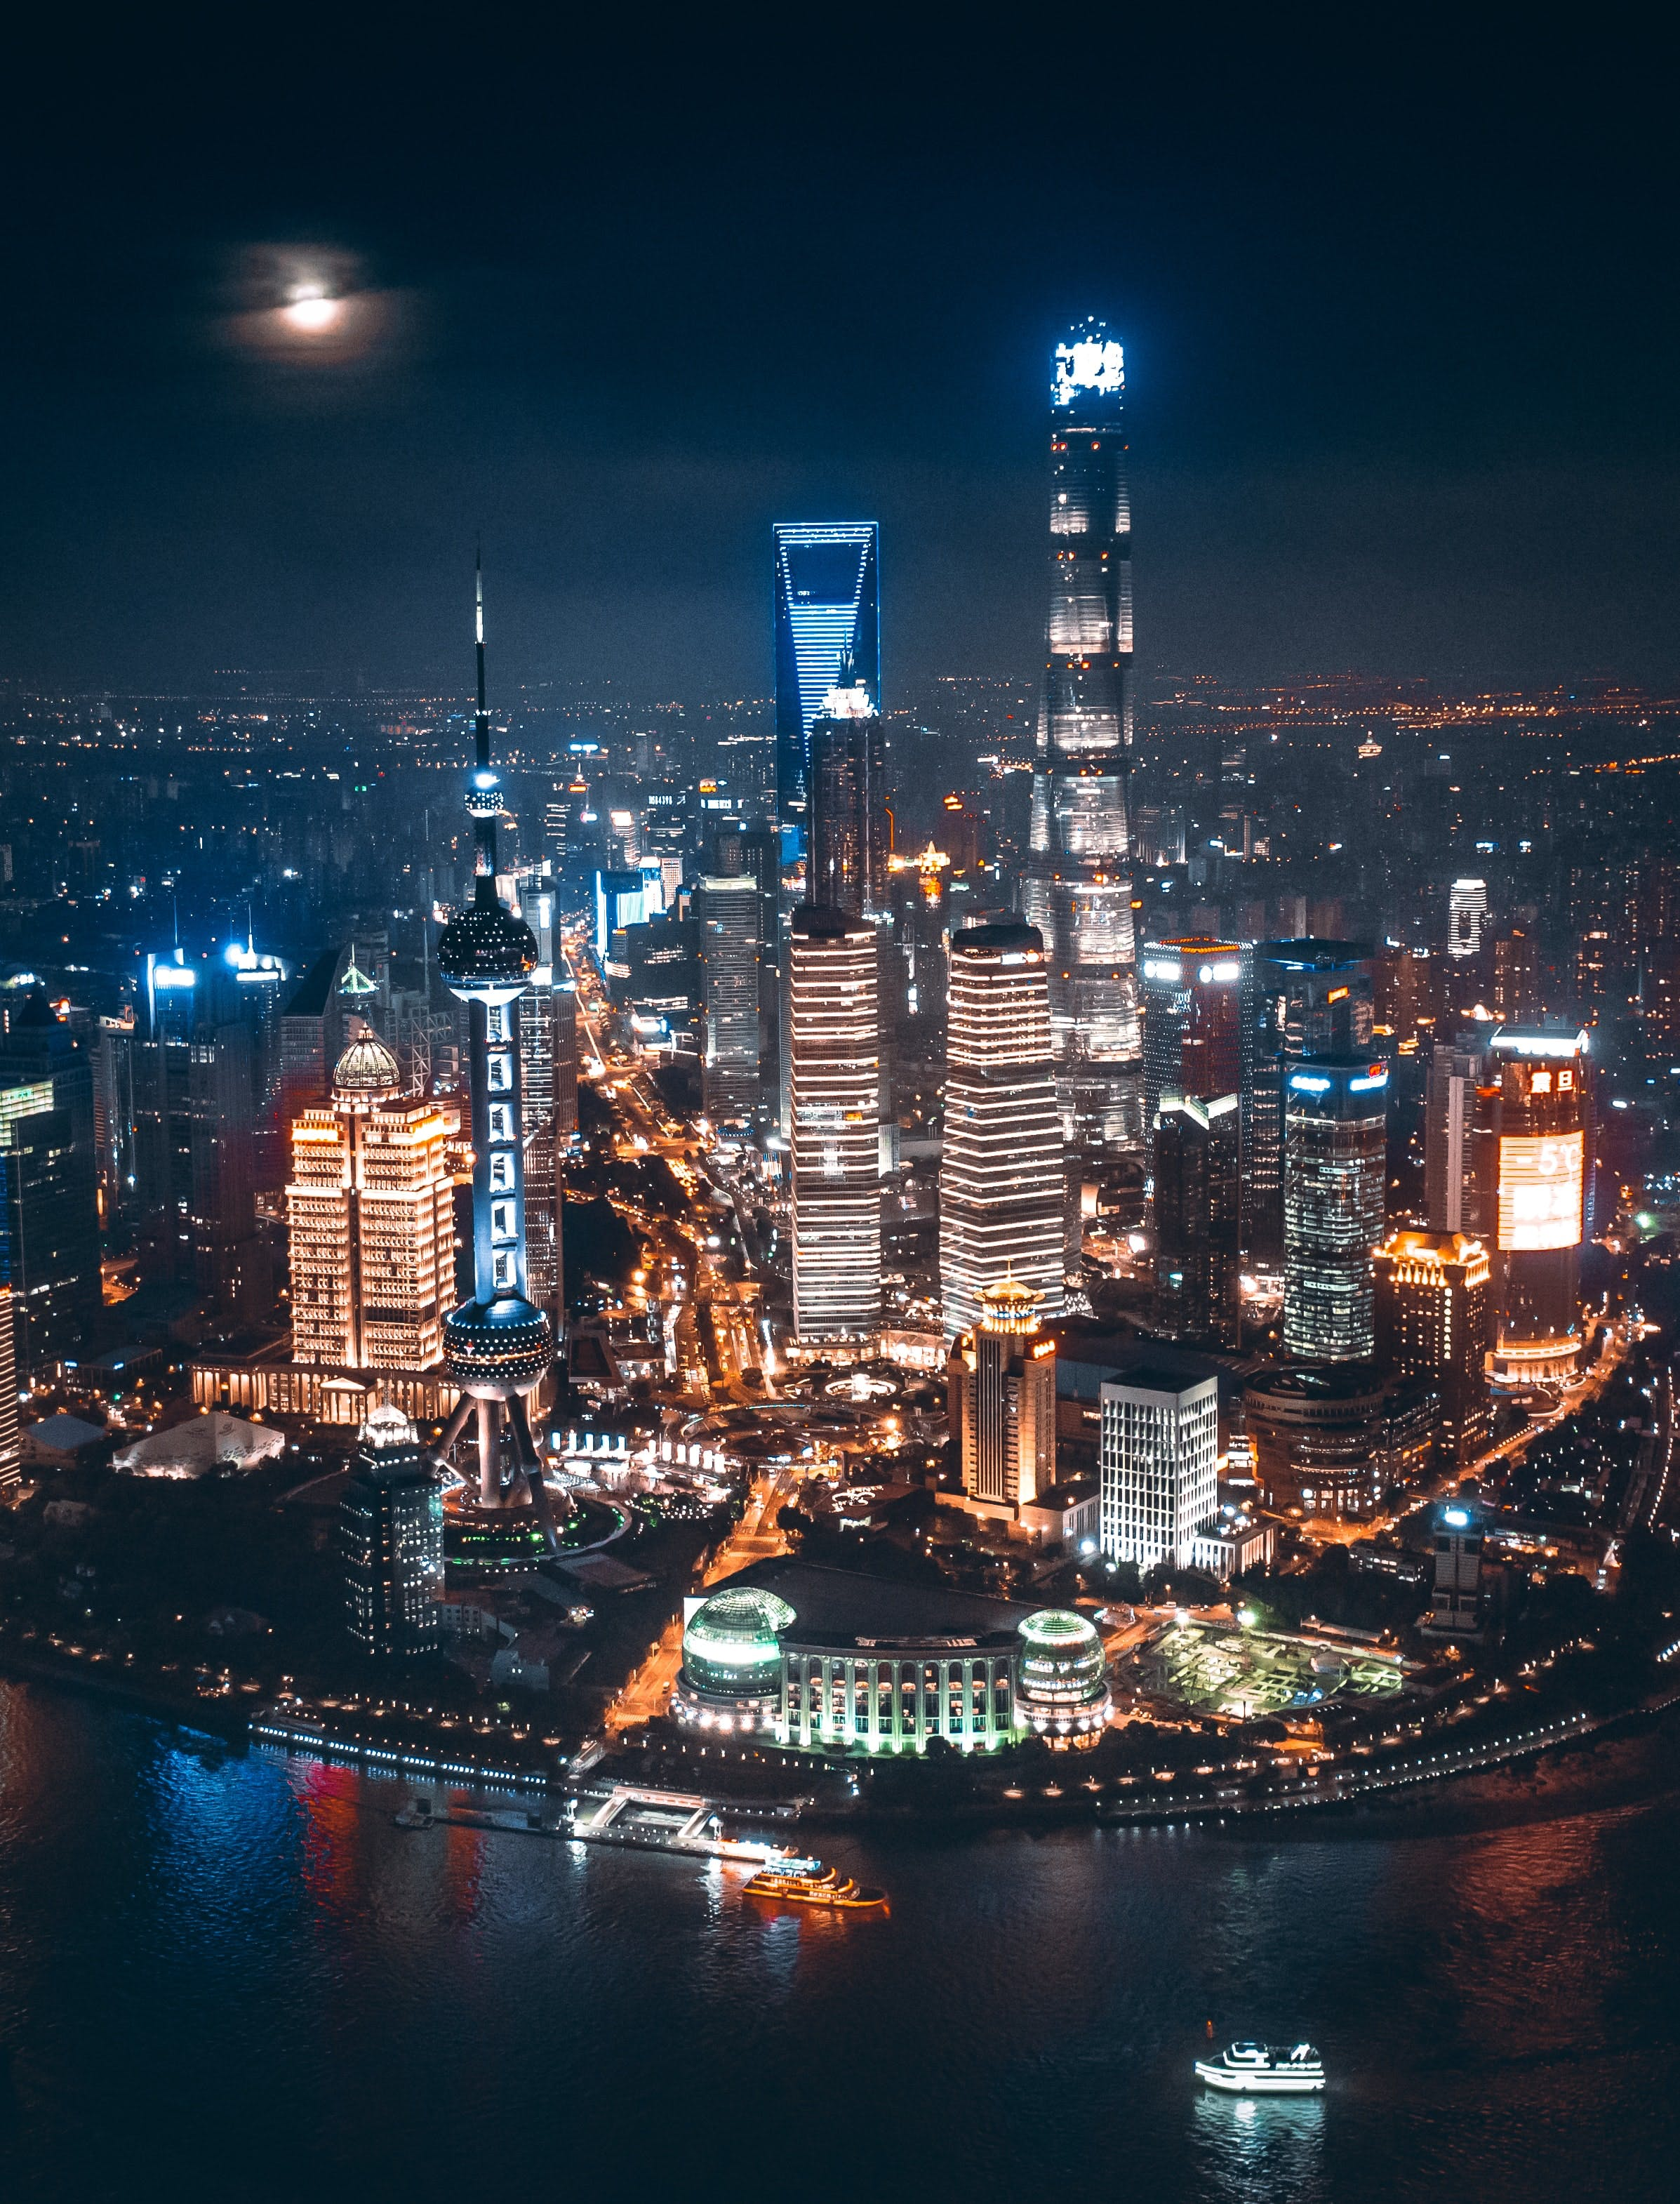 Night sky over Shanghai, China